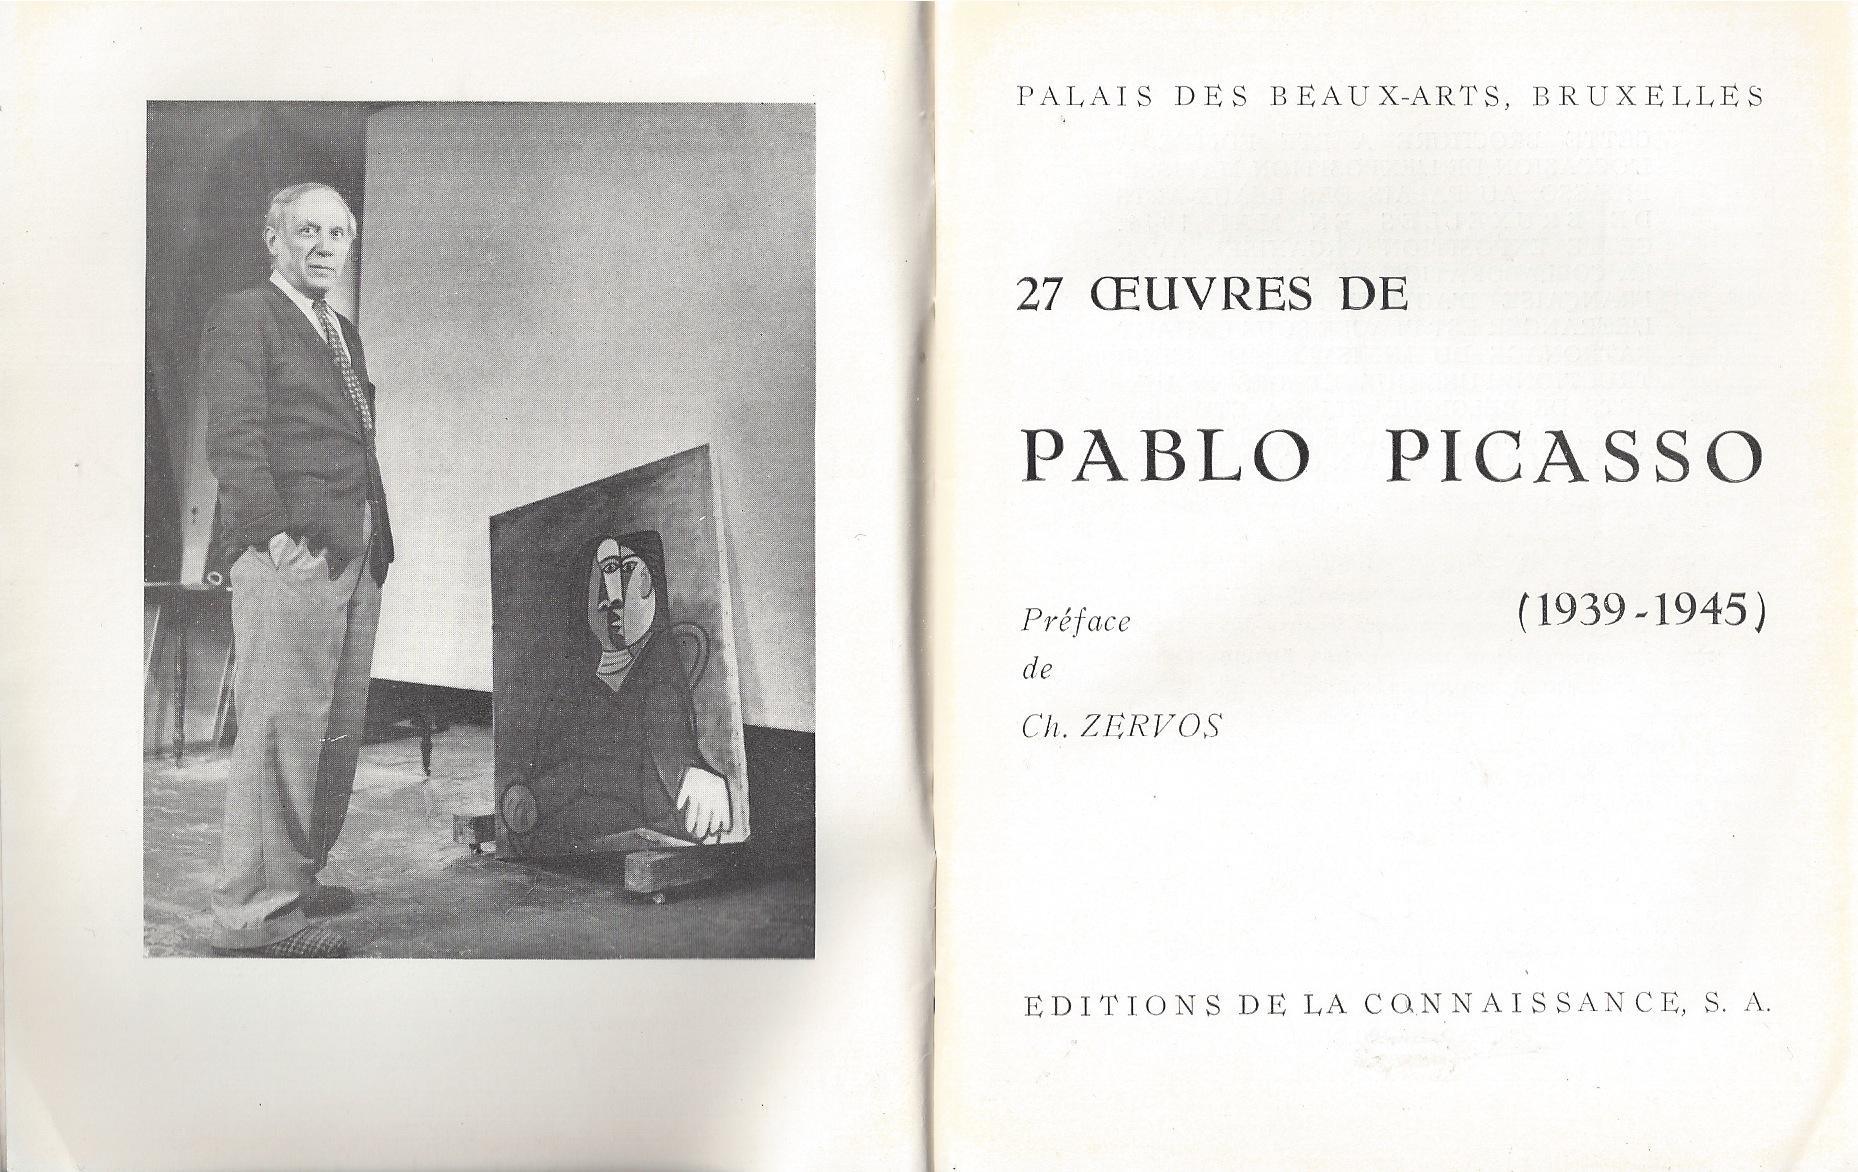 27 Oeuvres de Pablo Picasso (1939-1945) -: Zervos, Christian -